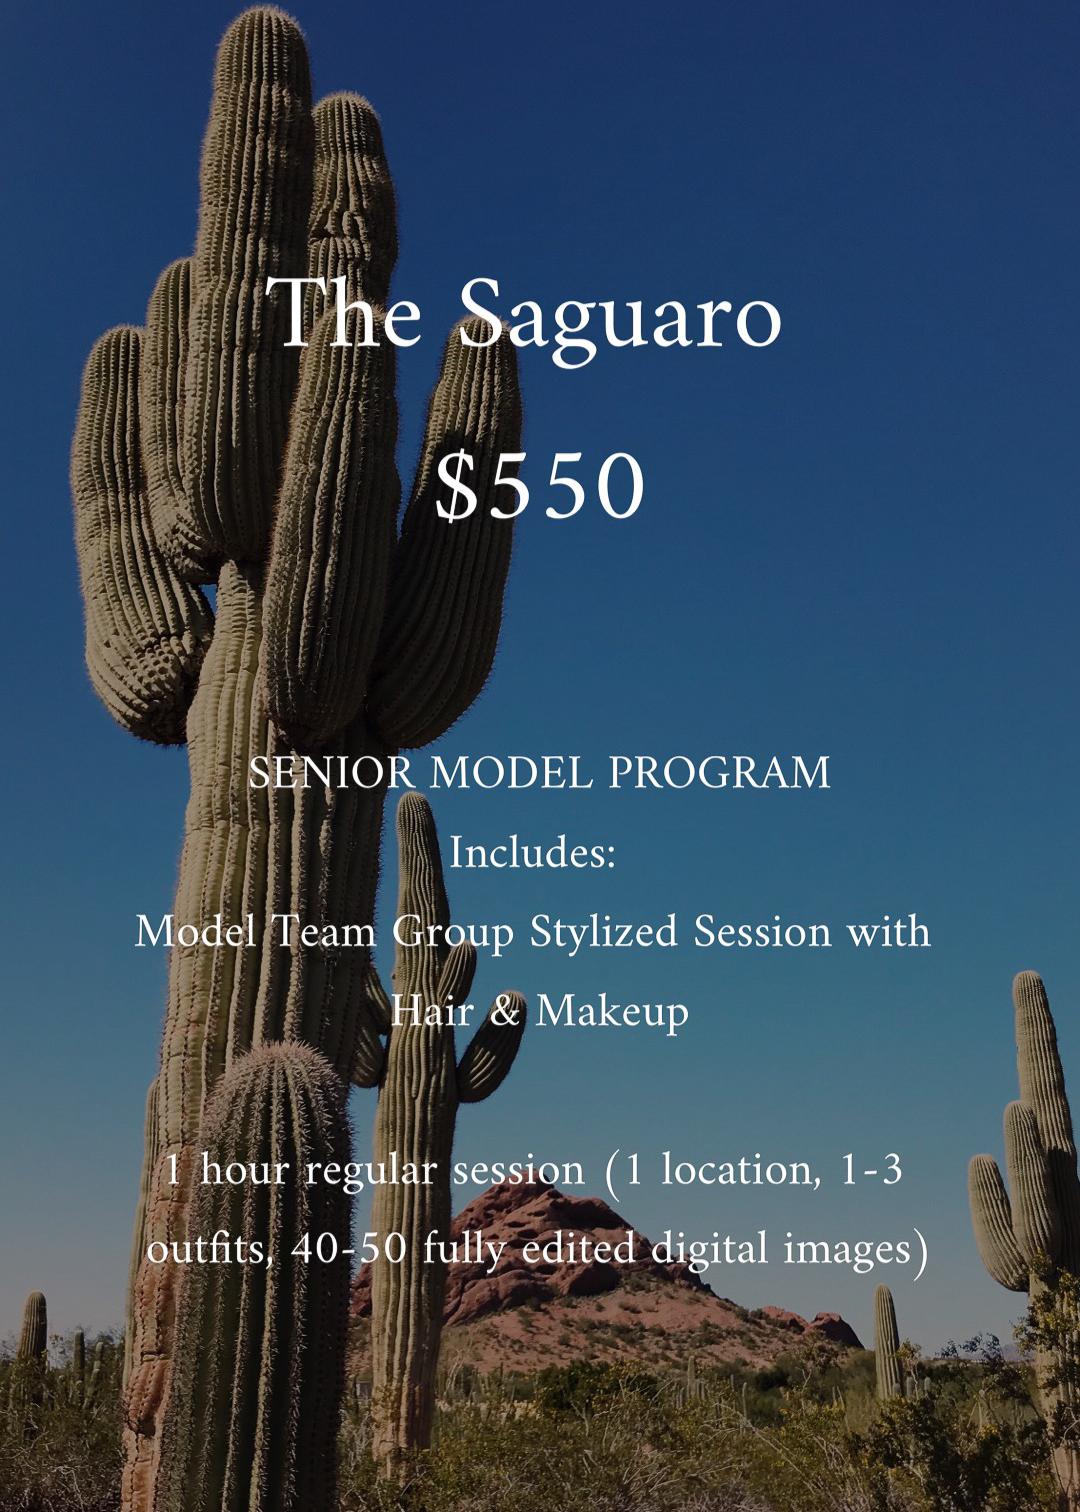 TheSaguaroClassof2020Packages_PhoenixSeniorPhotographer_SamanthaRosePhotography_-2.jpg